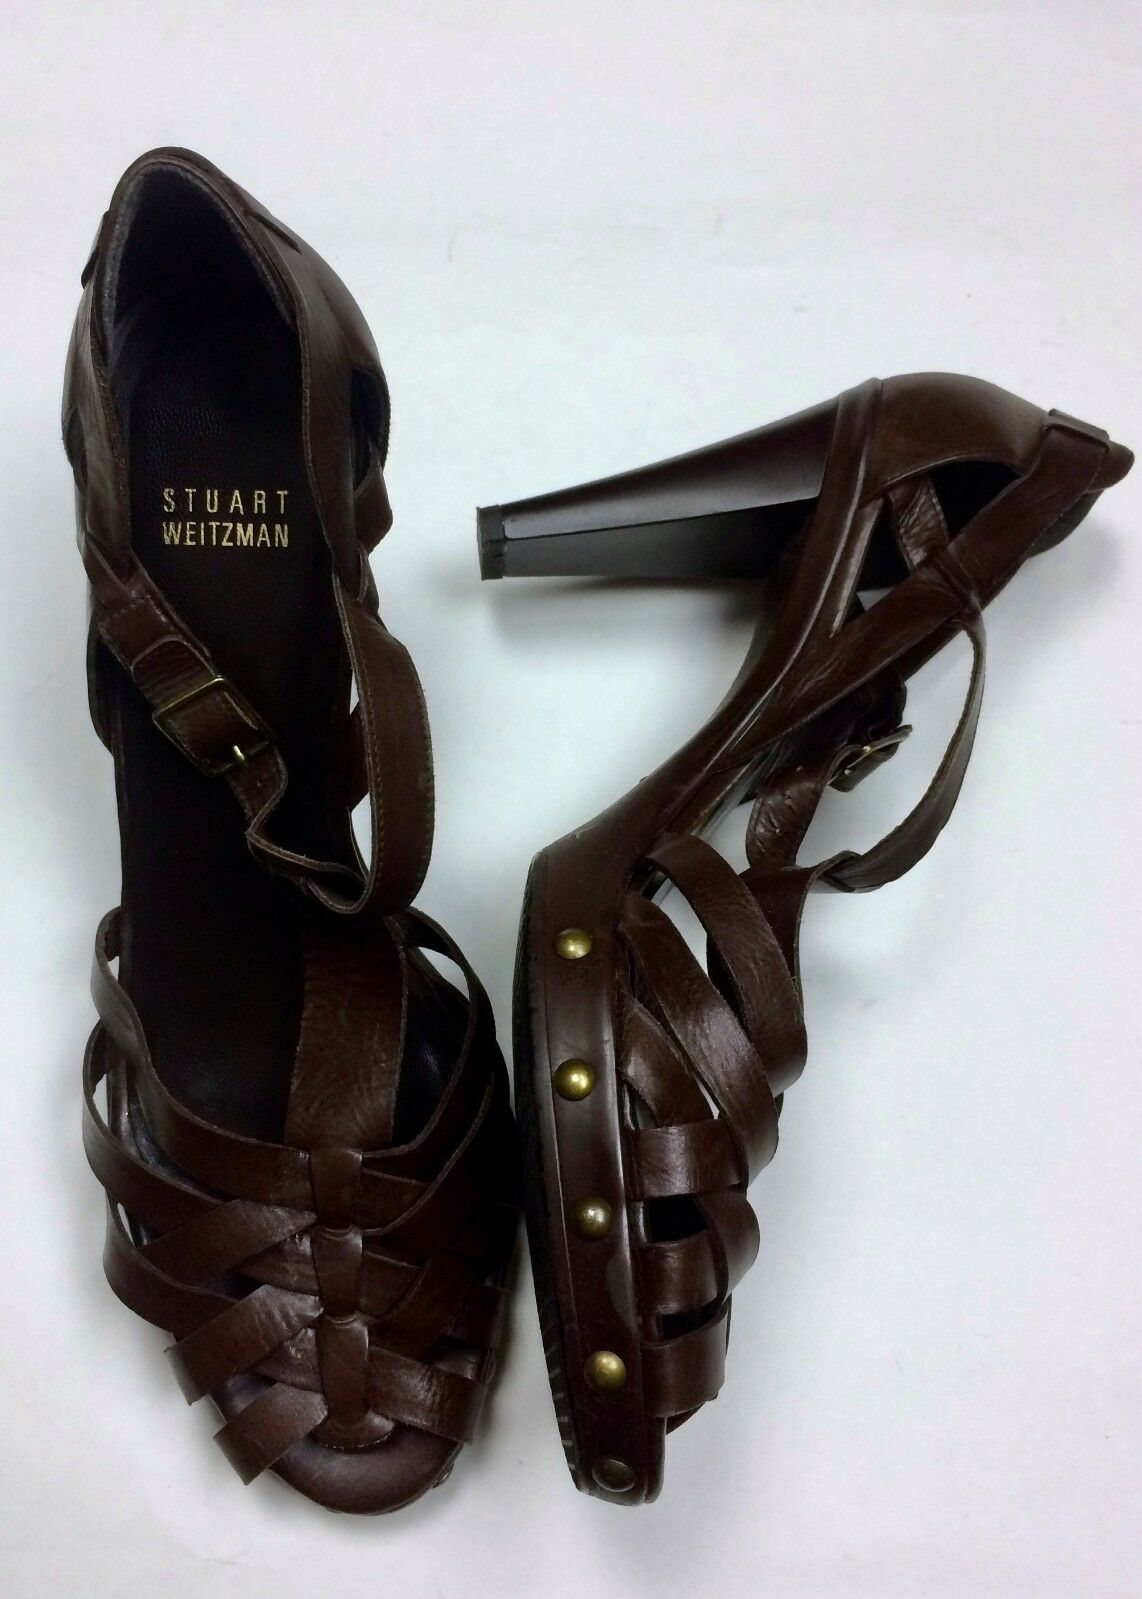 presa Stuart Weitzman 10 Marrone Woven Leather Open Toe Toe Toe Strappy scarpe High Heel Sandals  moda